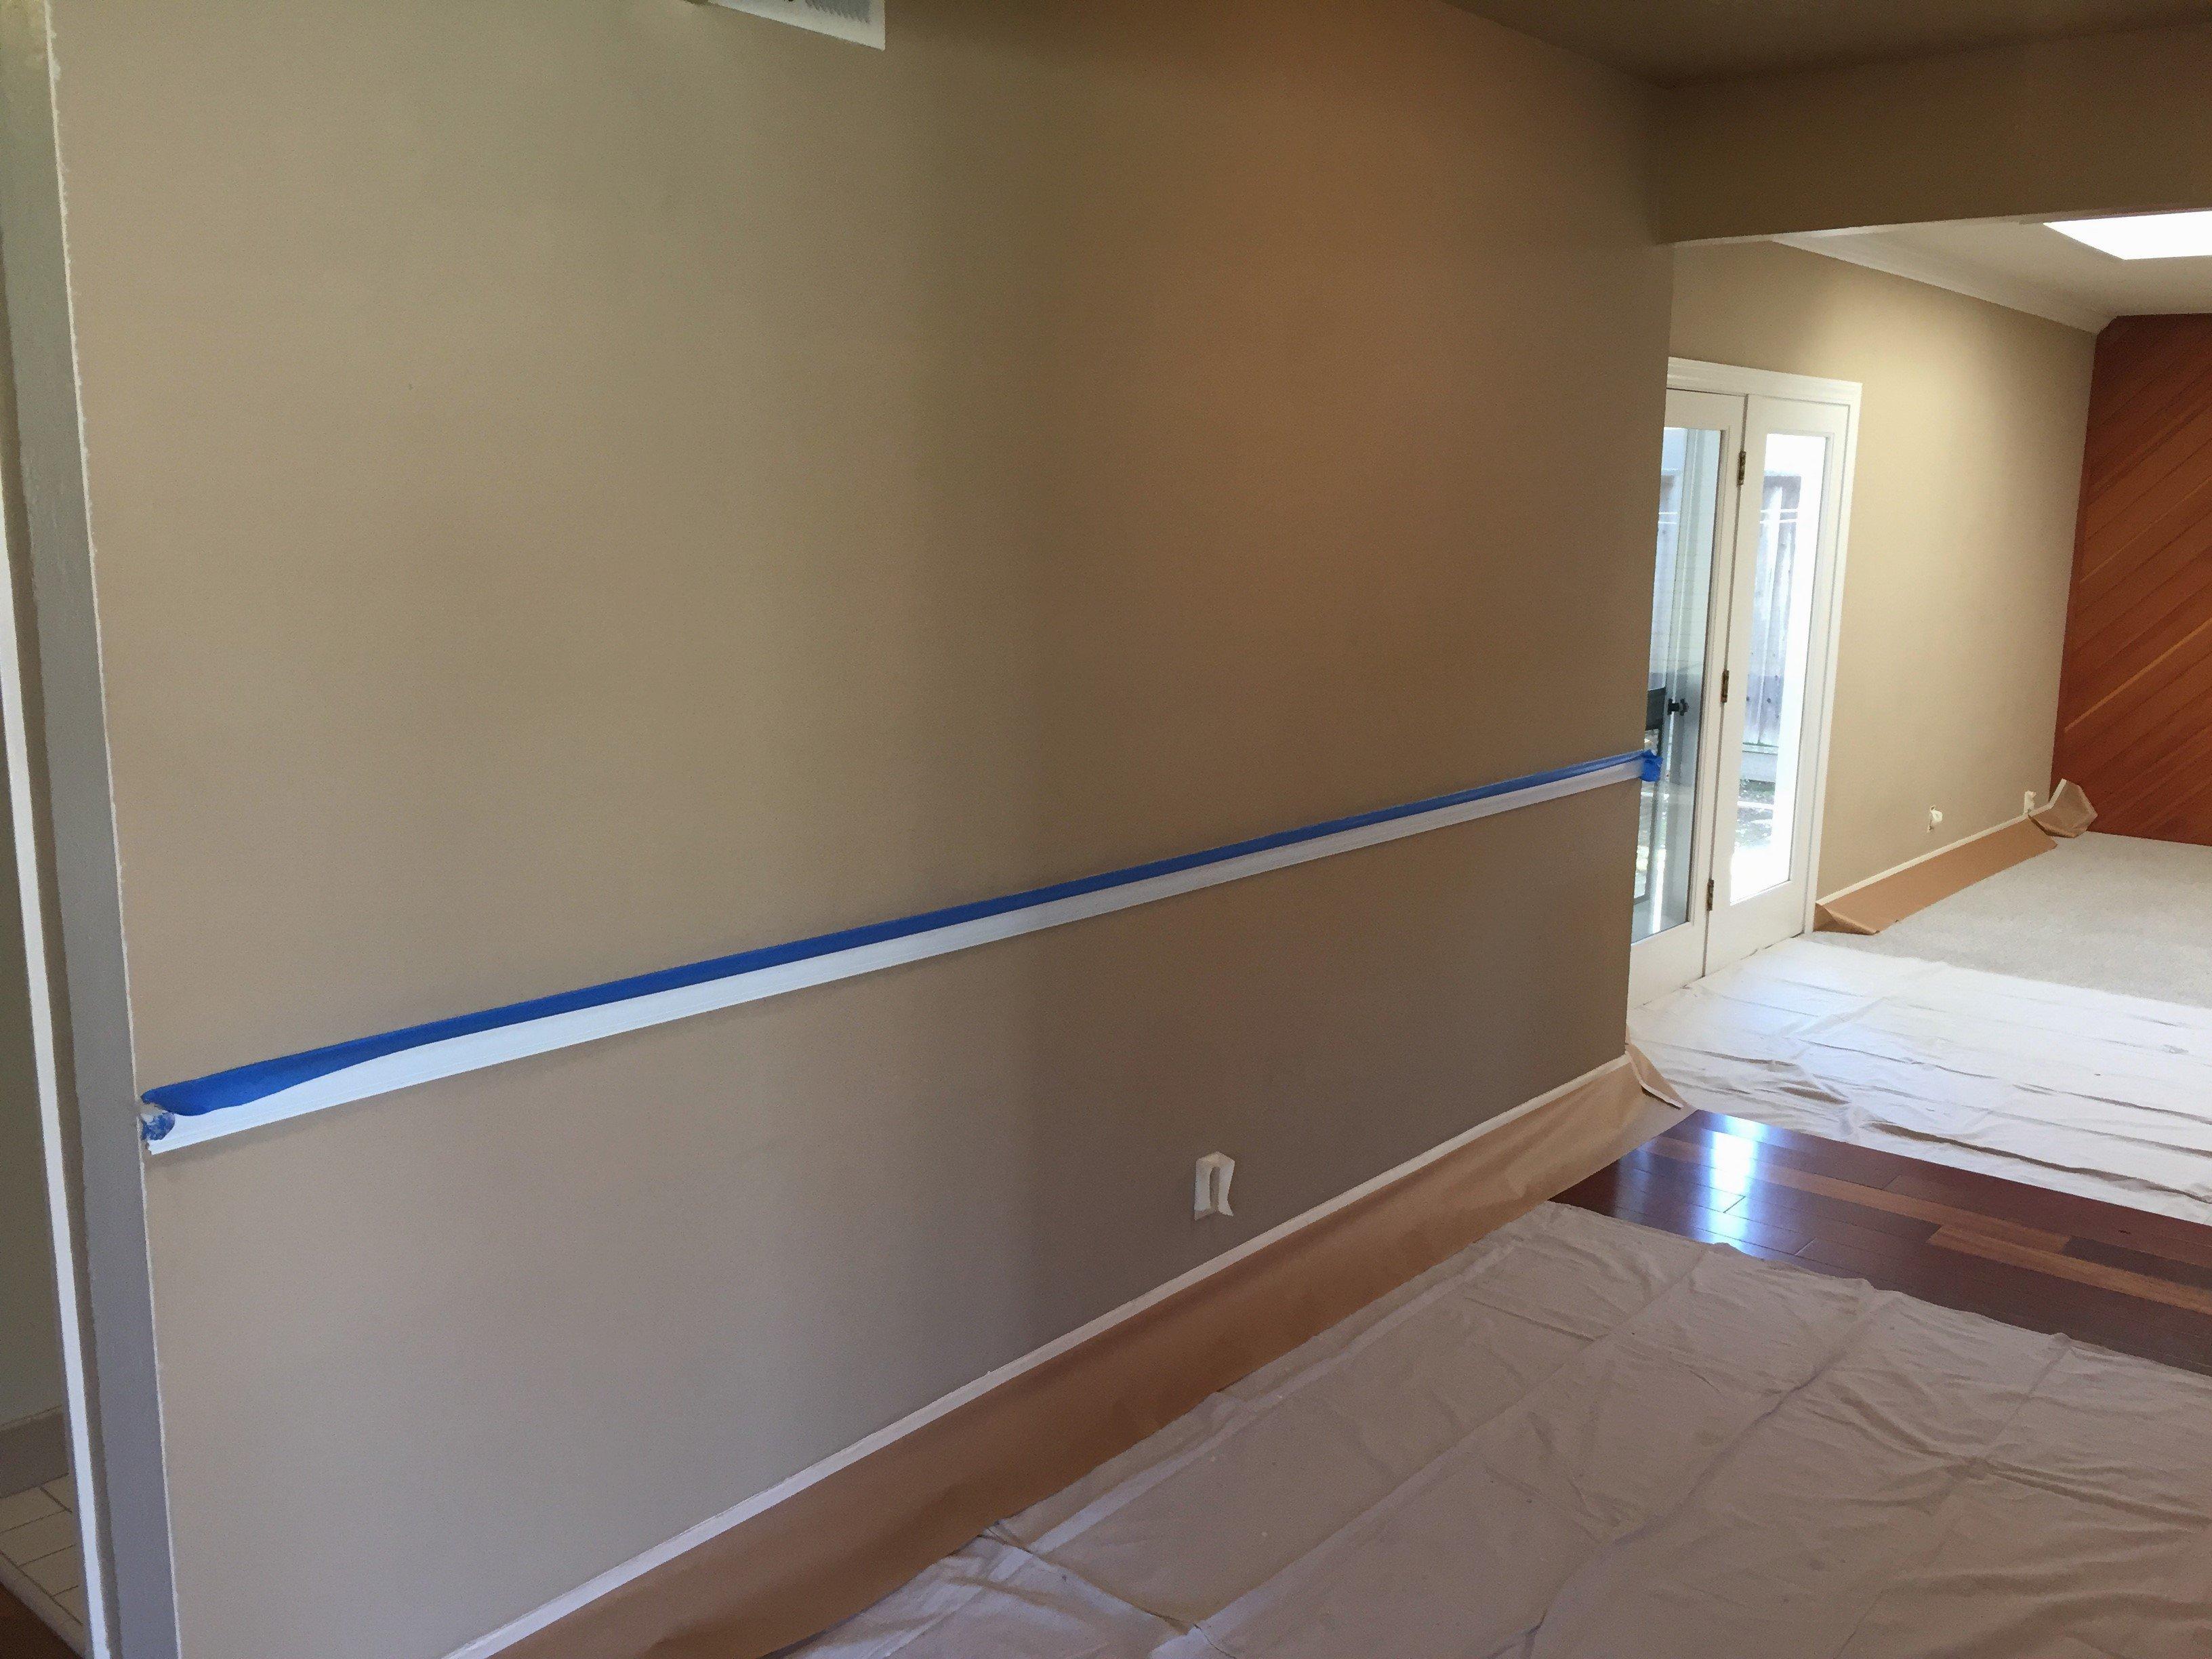 painting contractor San Jose CA